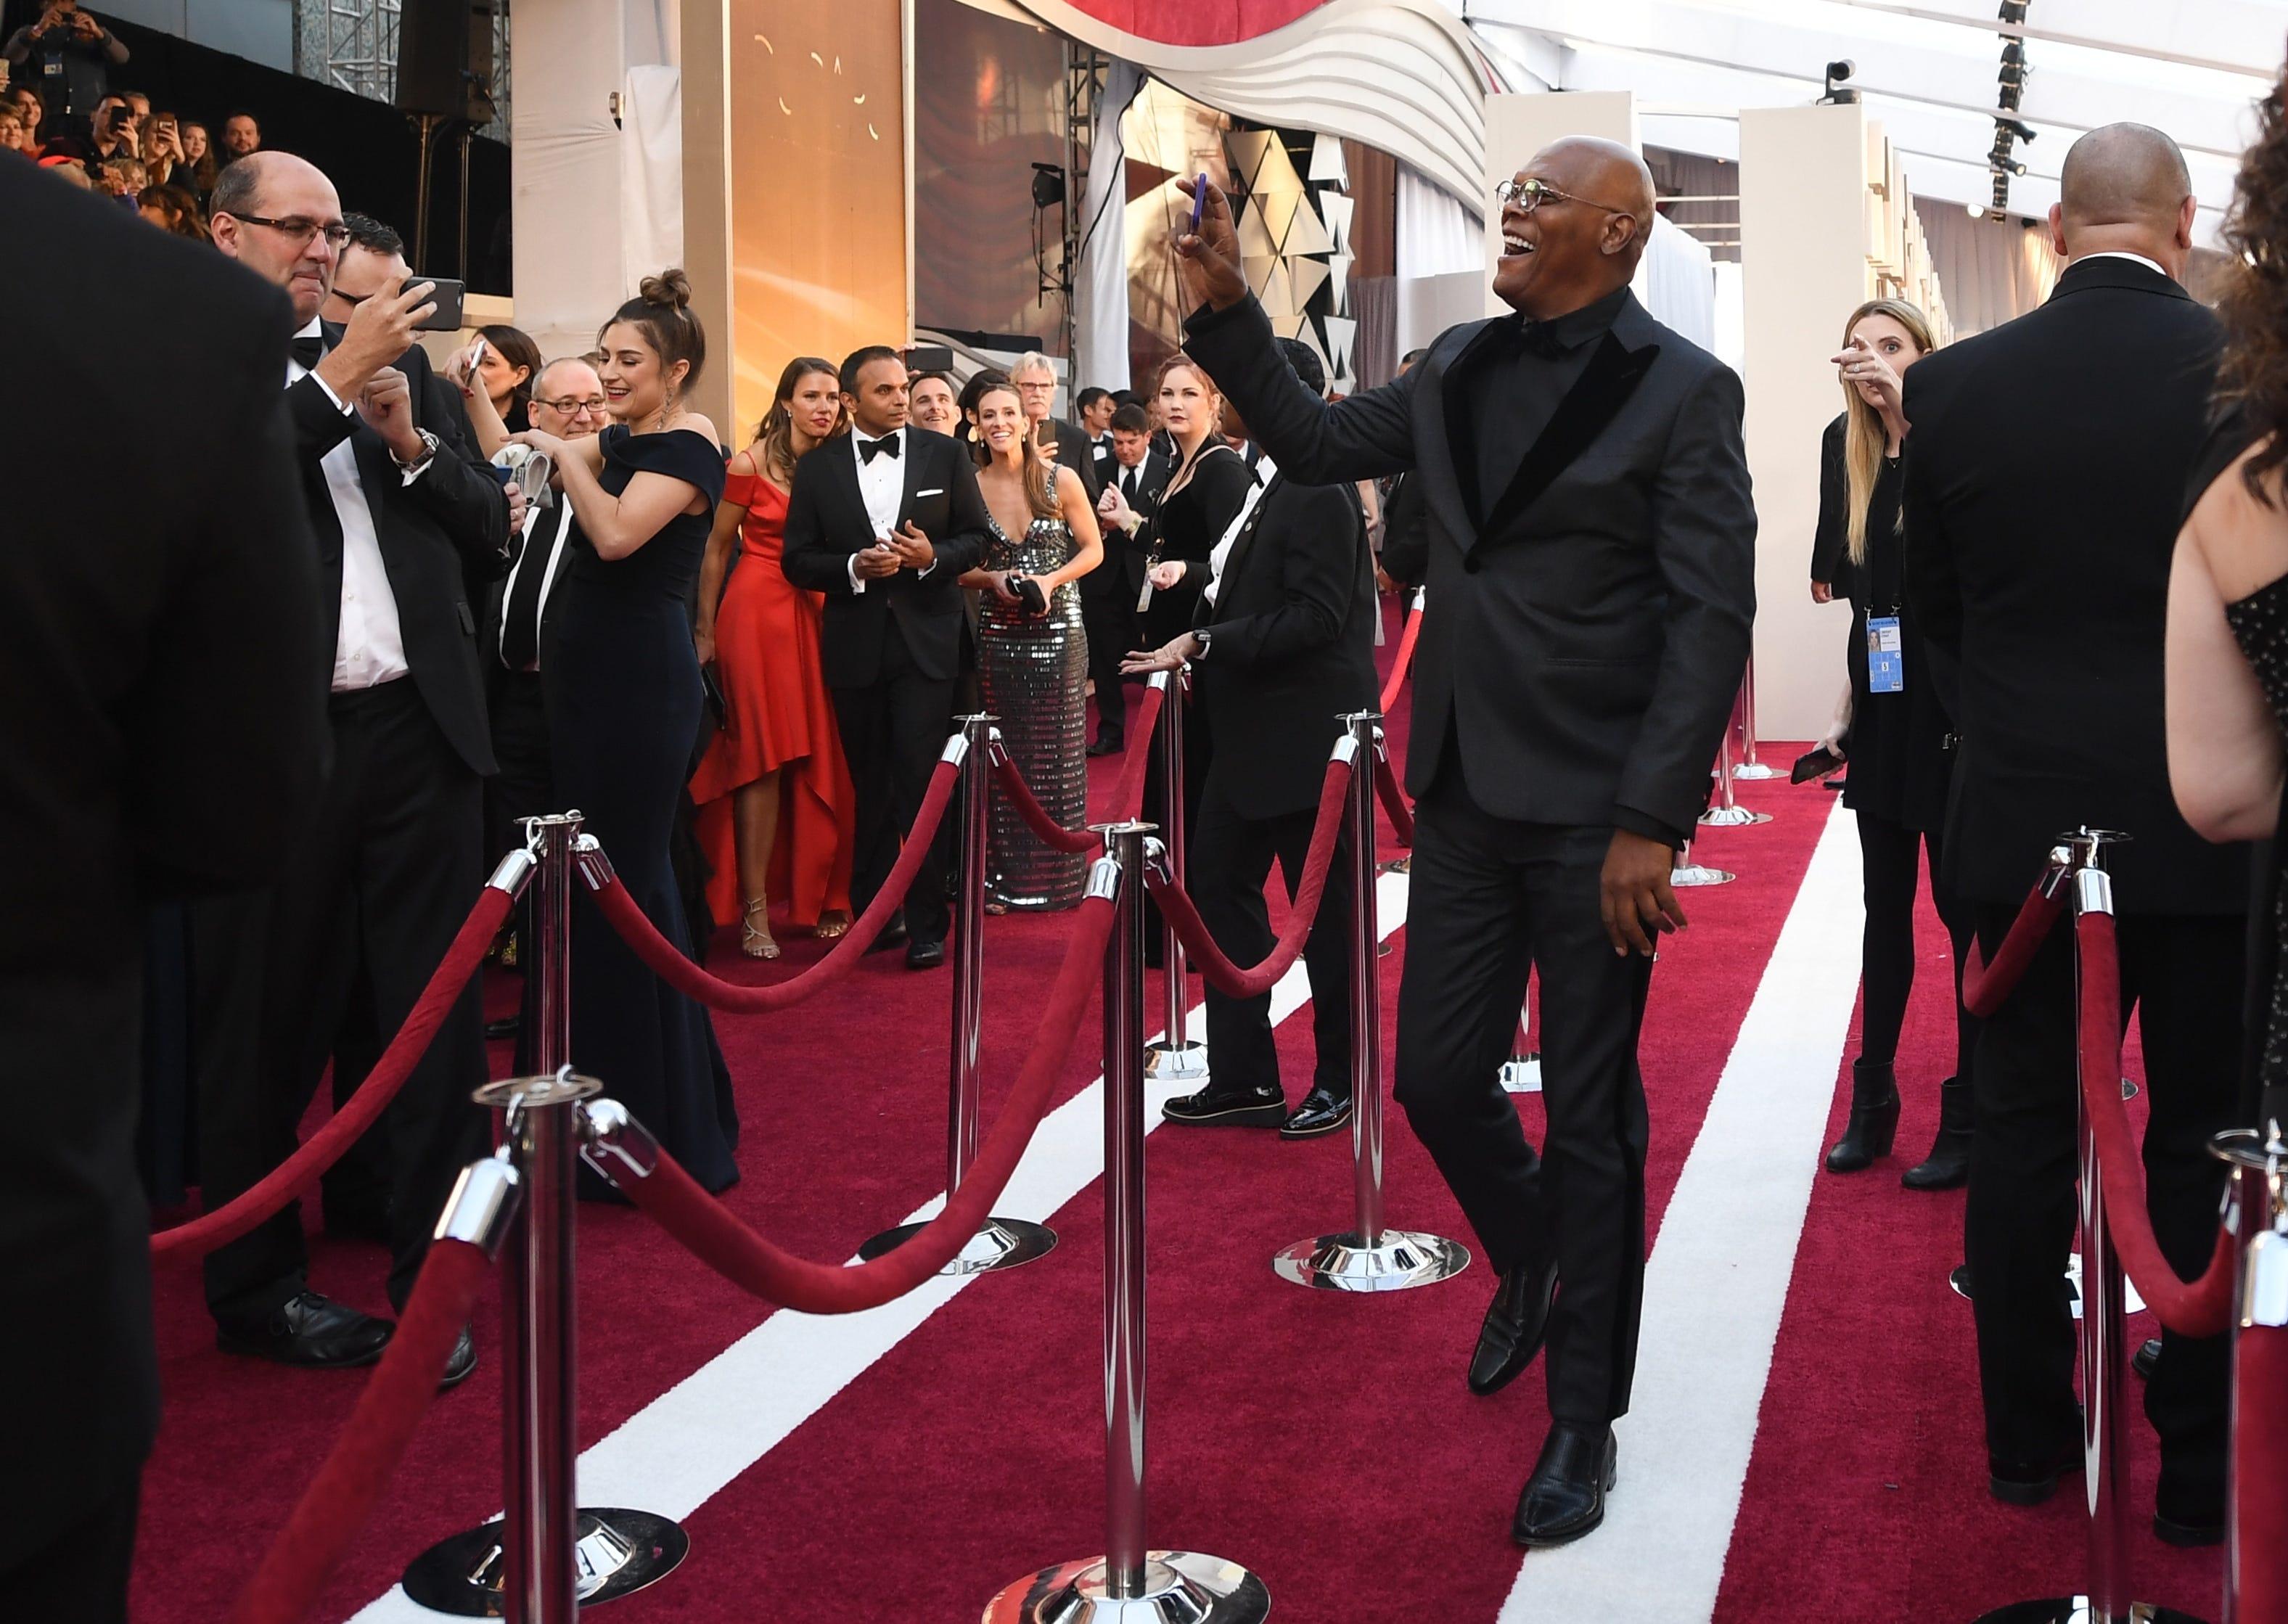 February 24, 2019; Los Angeles, CA, USA; Samuel L. Jackson arrives at the 91st Academy Awards at the Dolby Theatre. Mandatory Credit: Robert Hanashiro-USA TODAY NETWORK (Via OlyDrop)